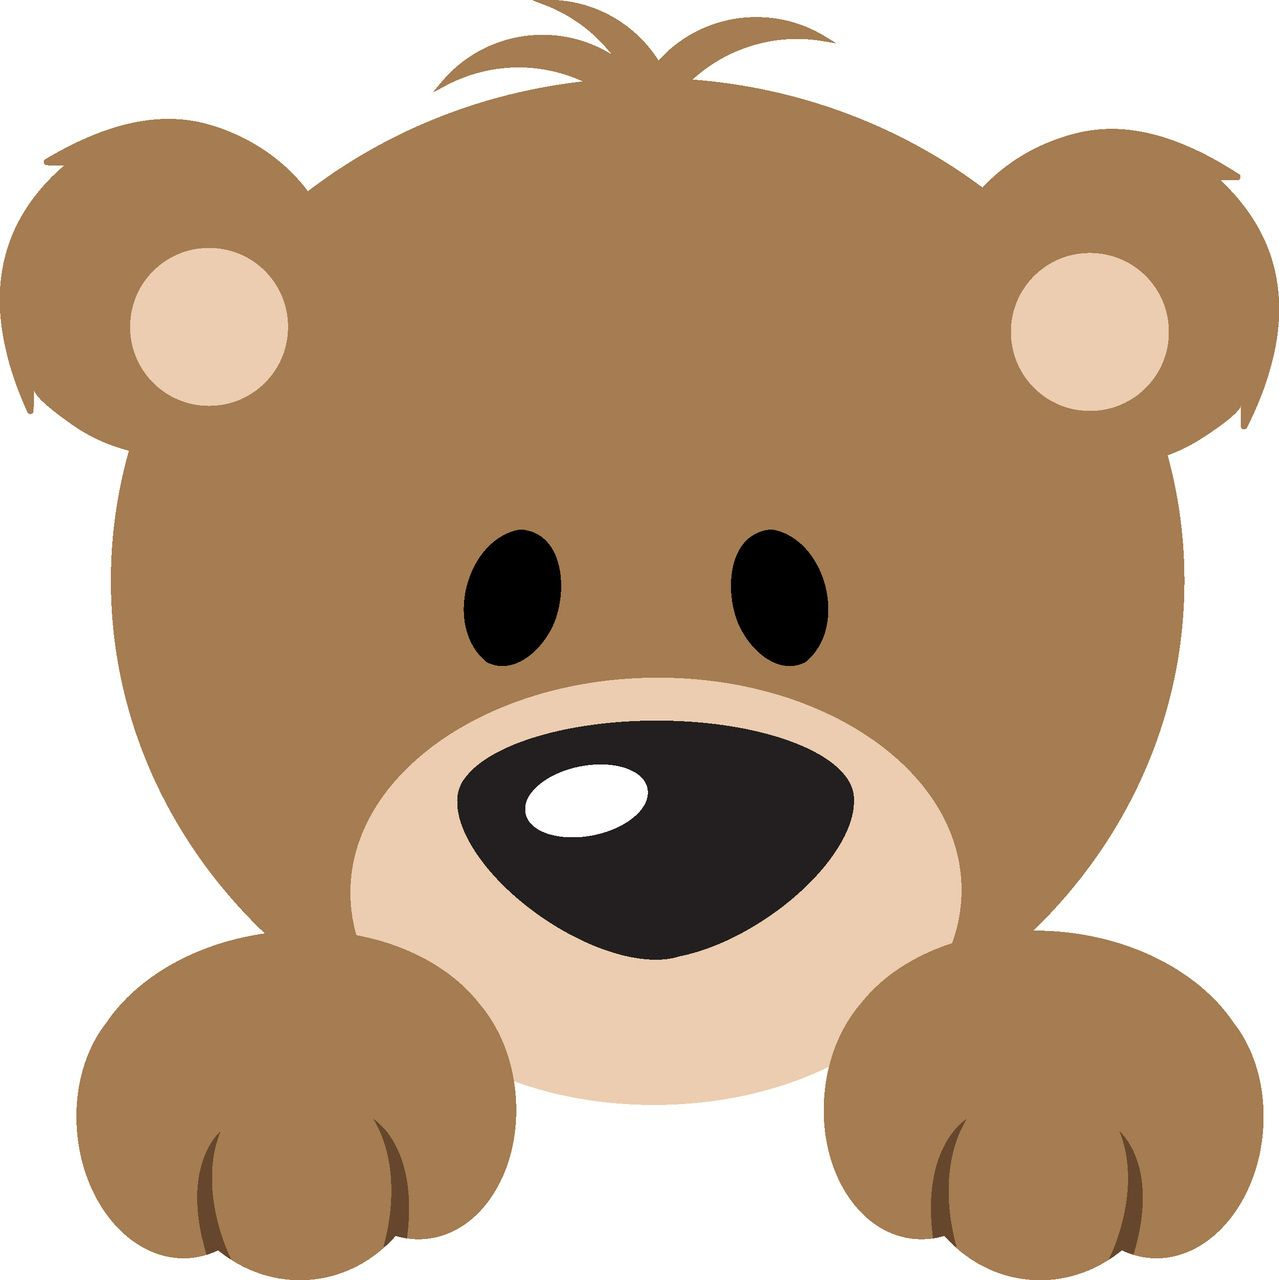 . ClipartLook.com Clipart · Cute Bear C-. ClipartLook.com Clipart · Cute Bear ClipartLook.com -3